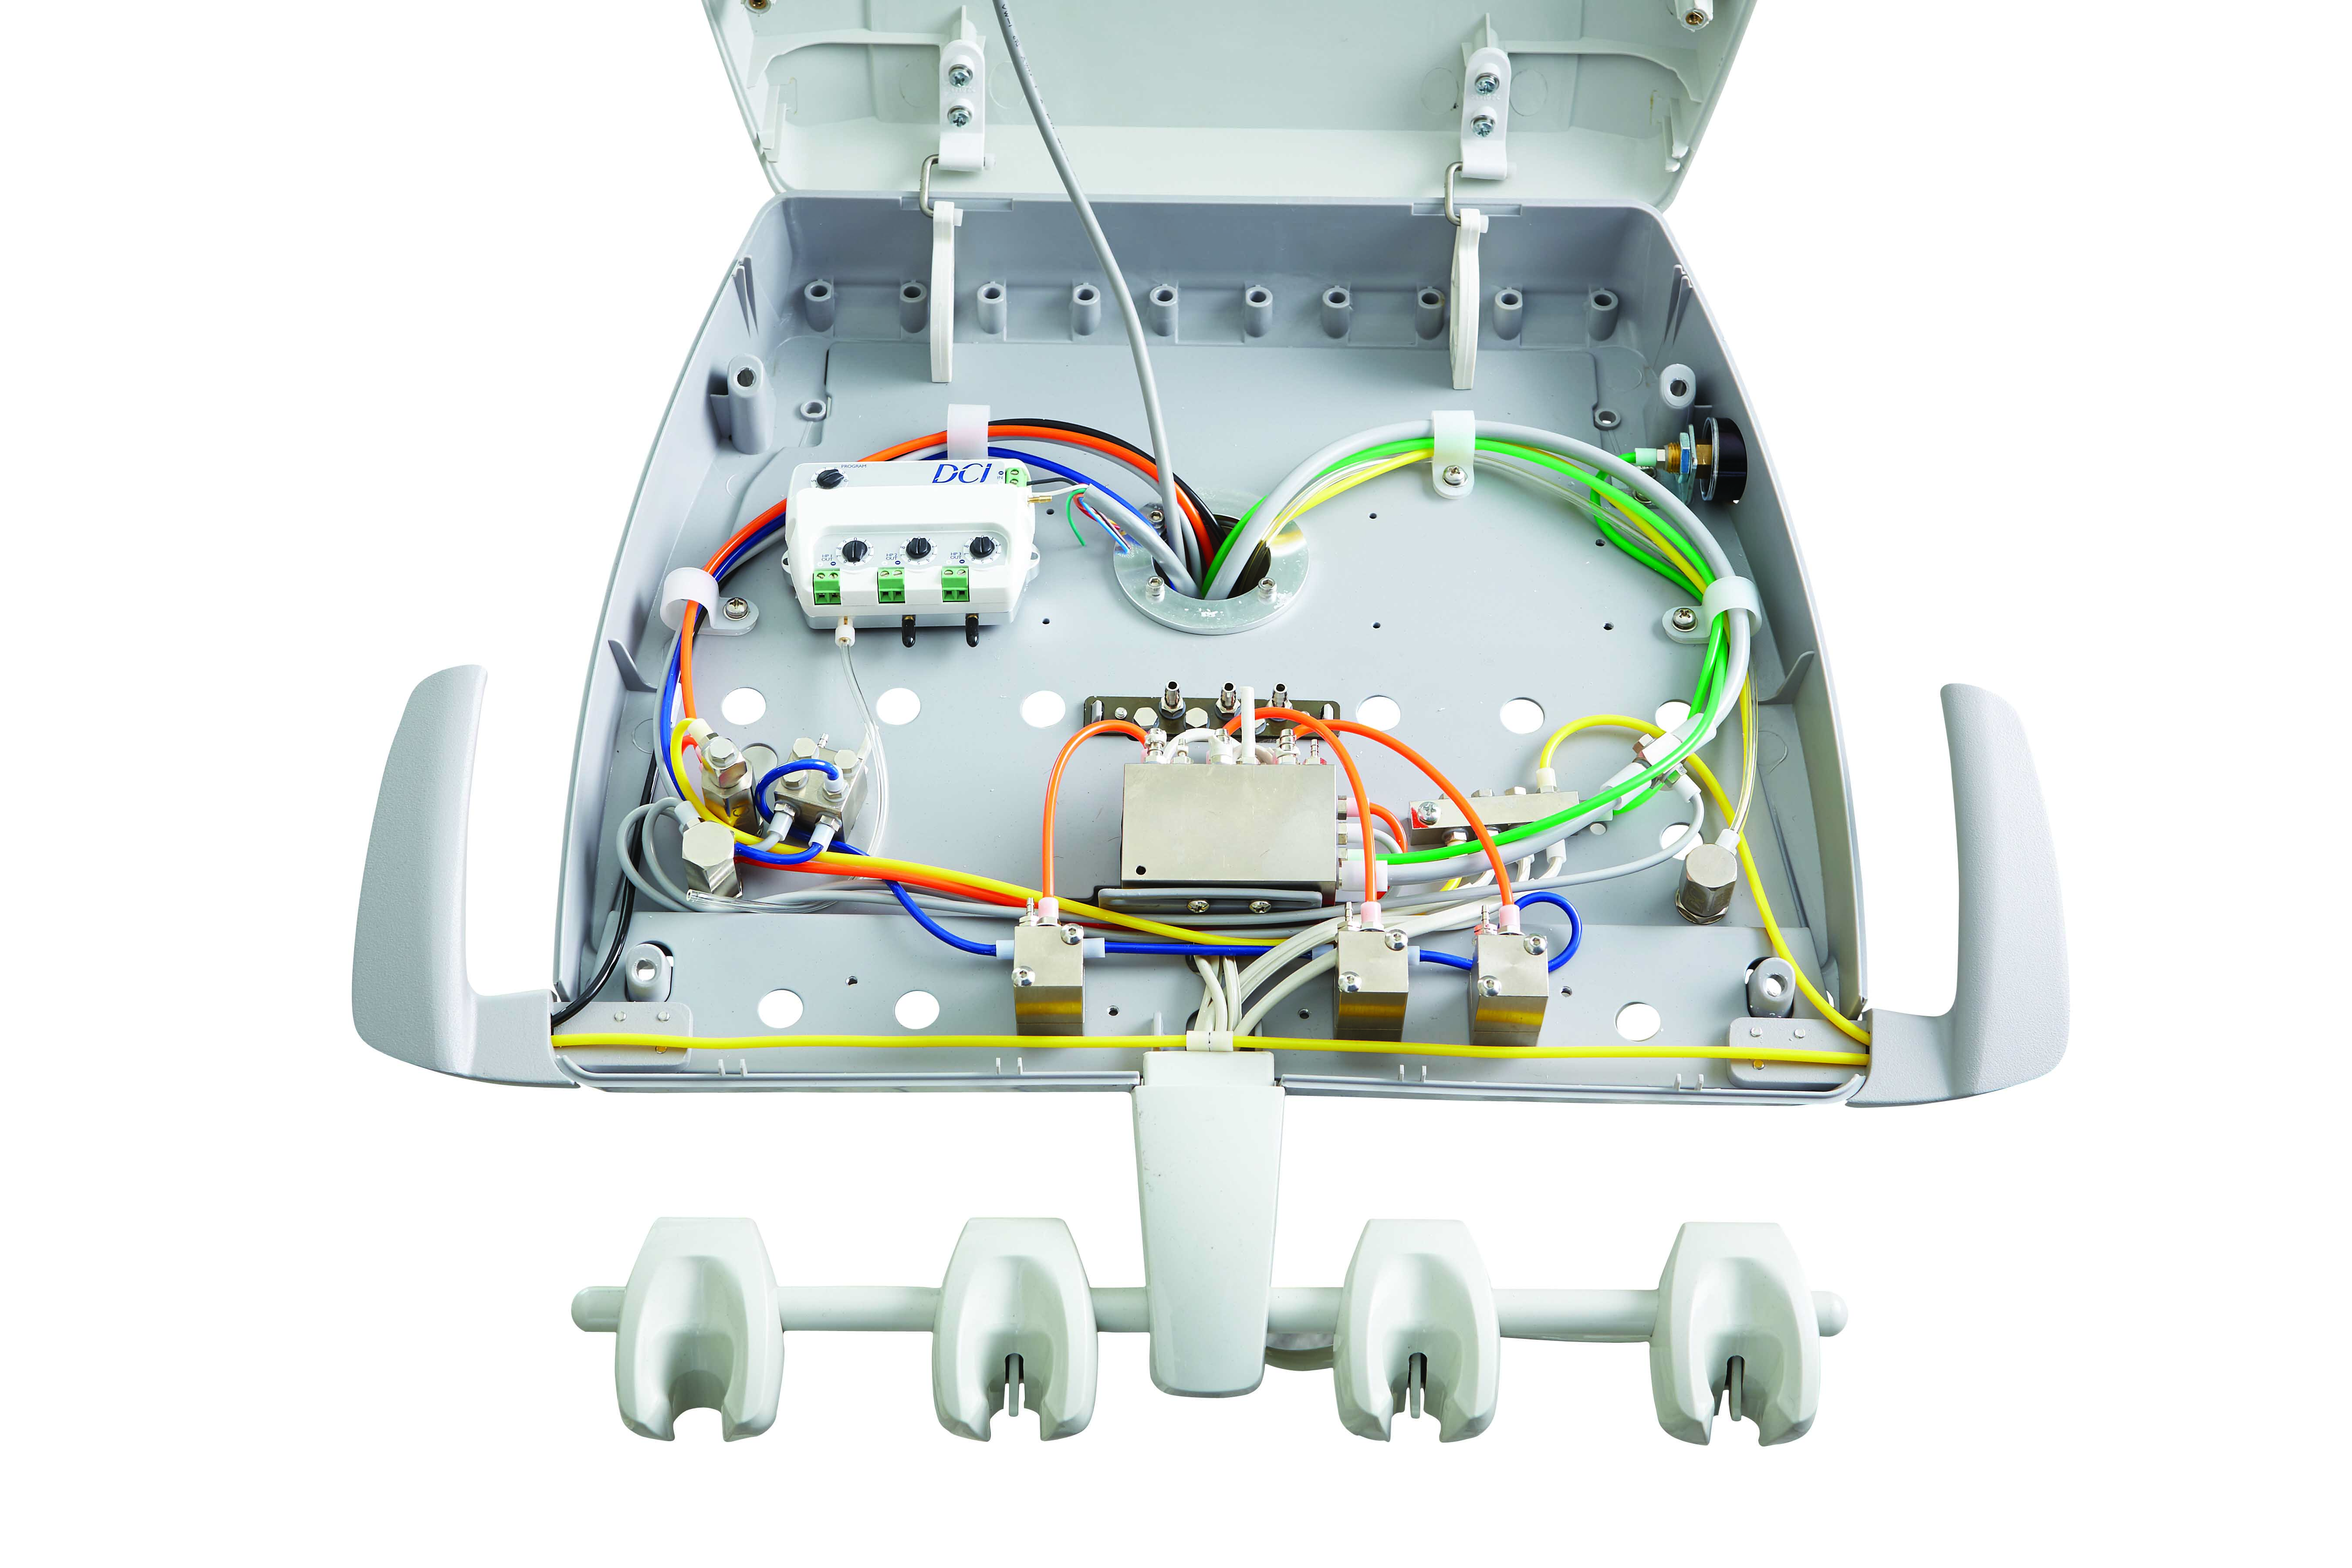 Dci Edge Series 5 Swing Mount Pole With Auto Dental Unit